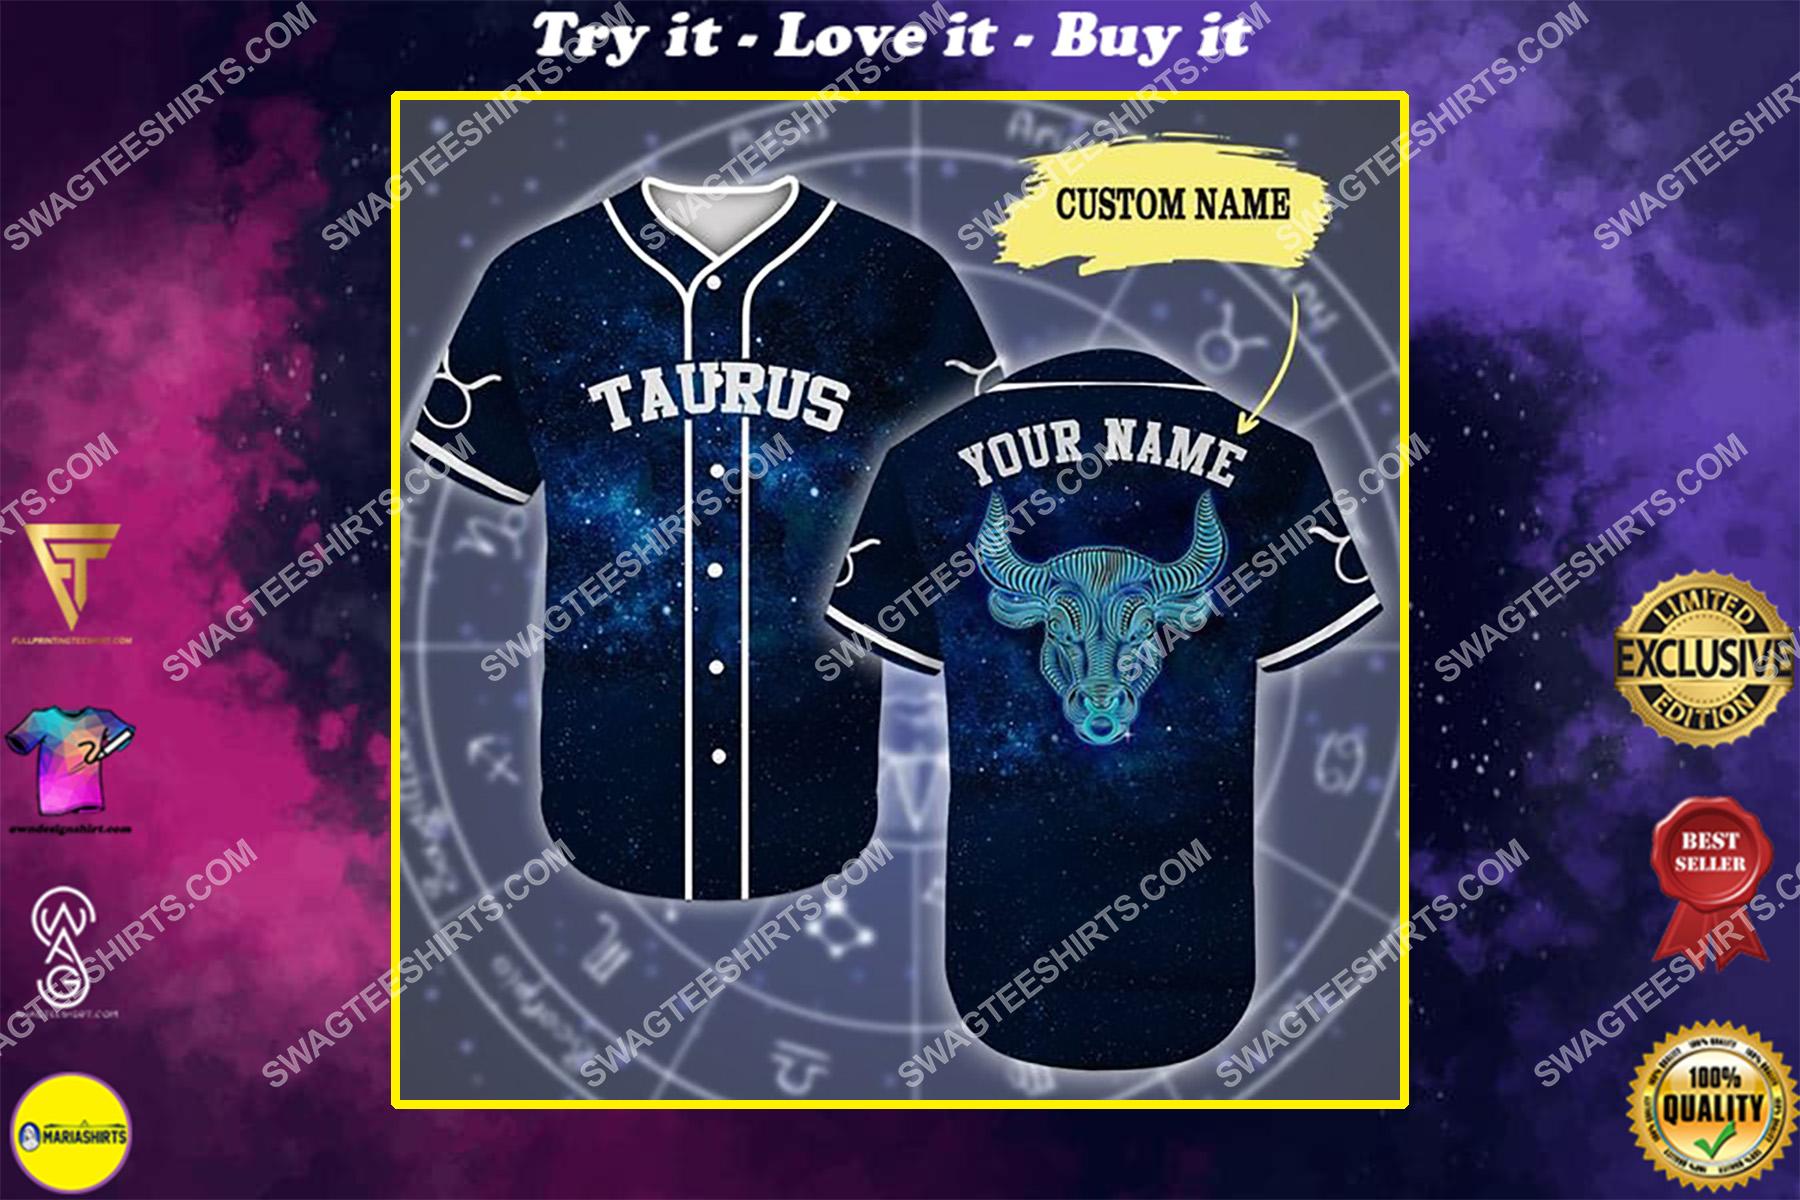 custom name taurus is mysterious zodiac all over printed baseball shirt